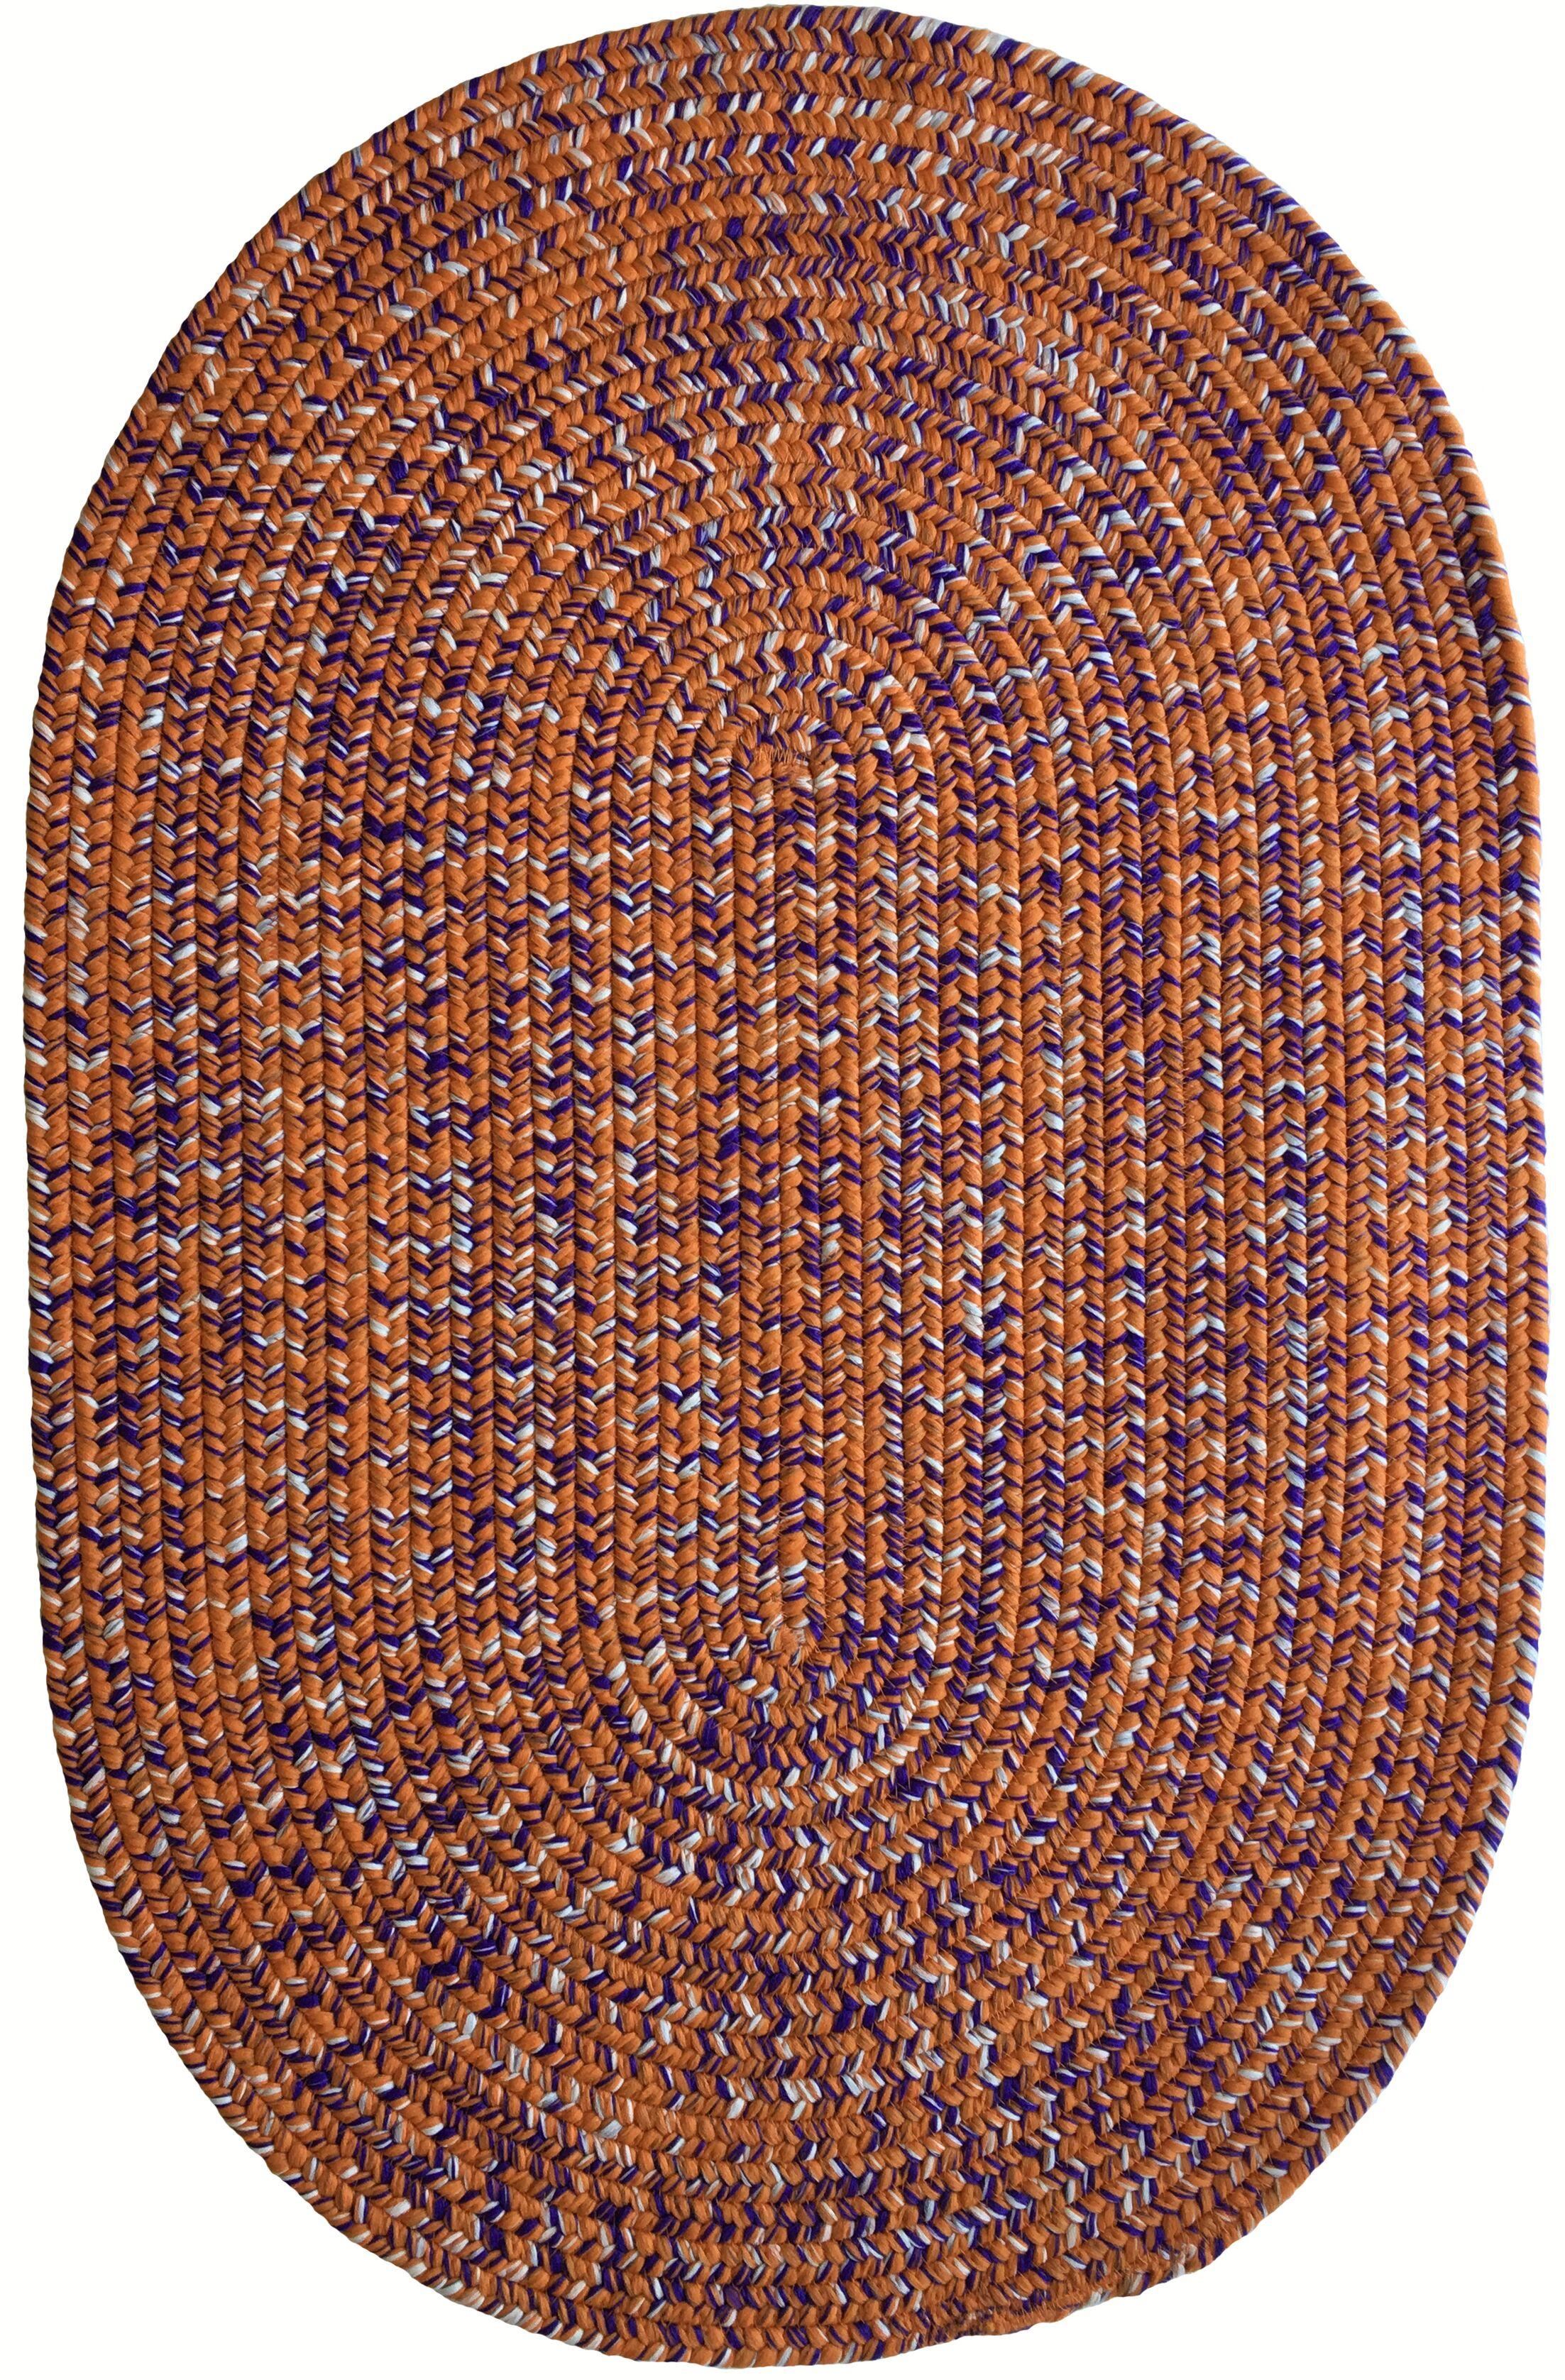 One-of-a-Kind Aukerman Hand-Braided Orange/Purple Indoor/Outdoor Area Rug Rug Size: Oval 4' x 6'